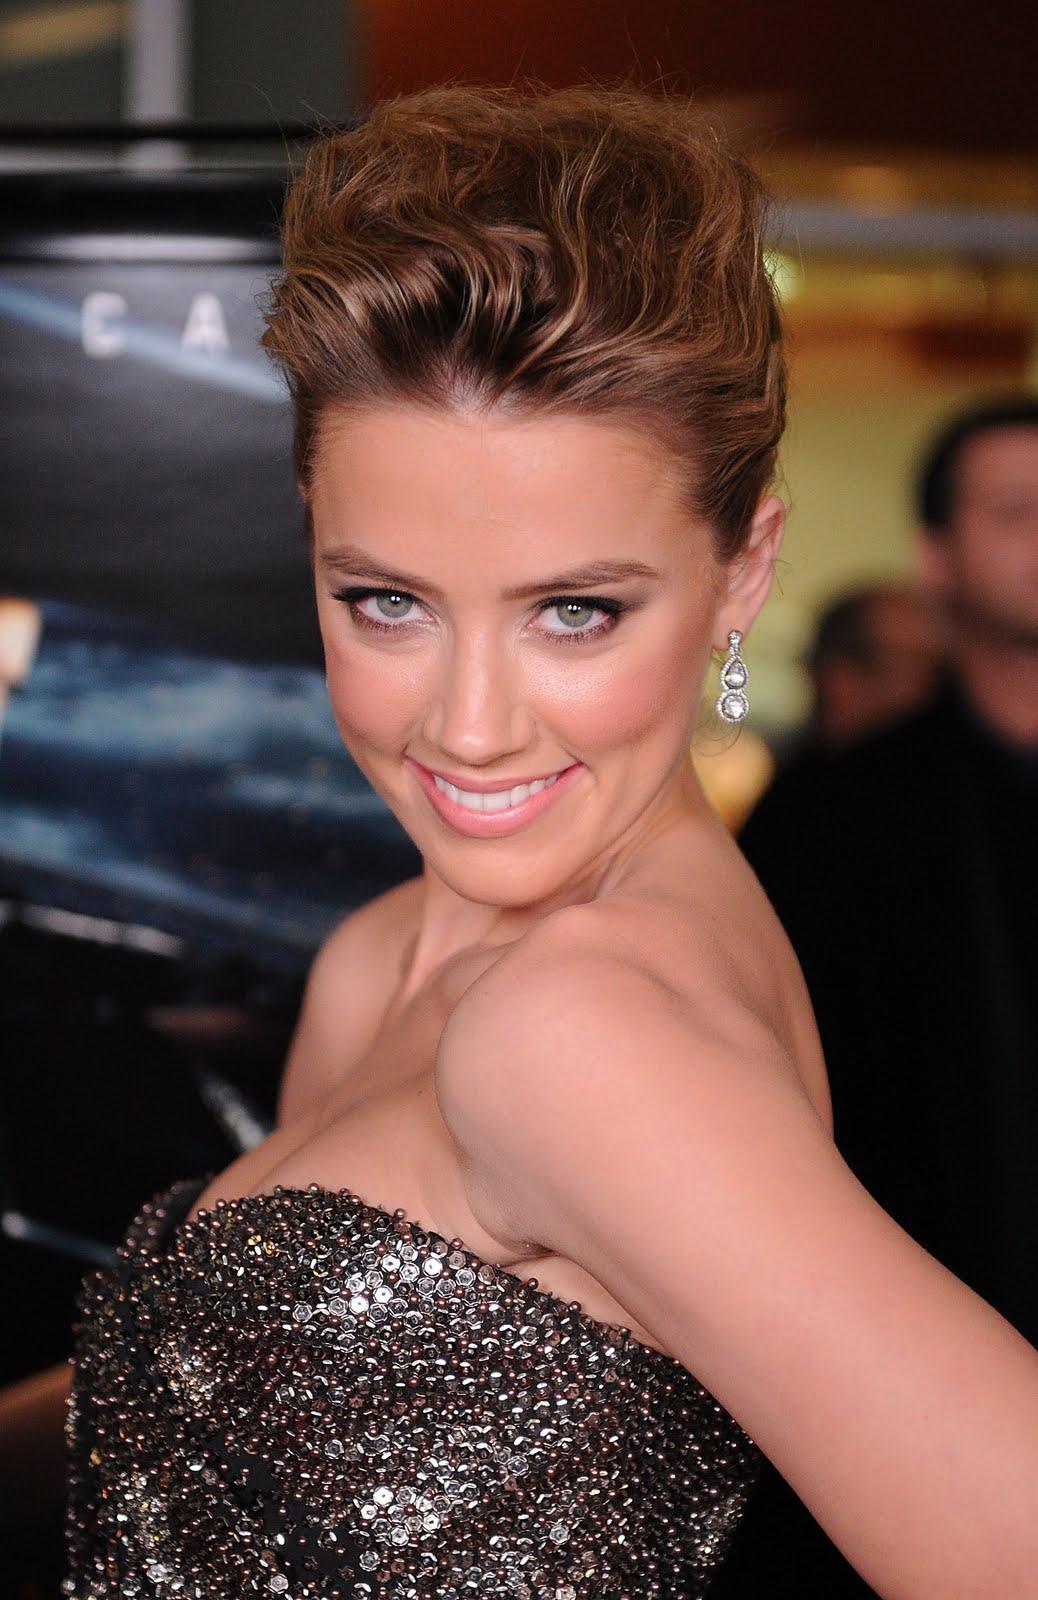 Amber Heard Is The Most Scientifically Beautiful Woman: Amber Heard In A Metallic Dress